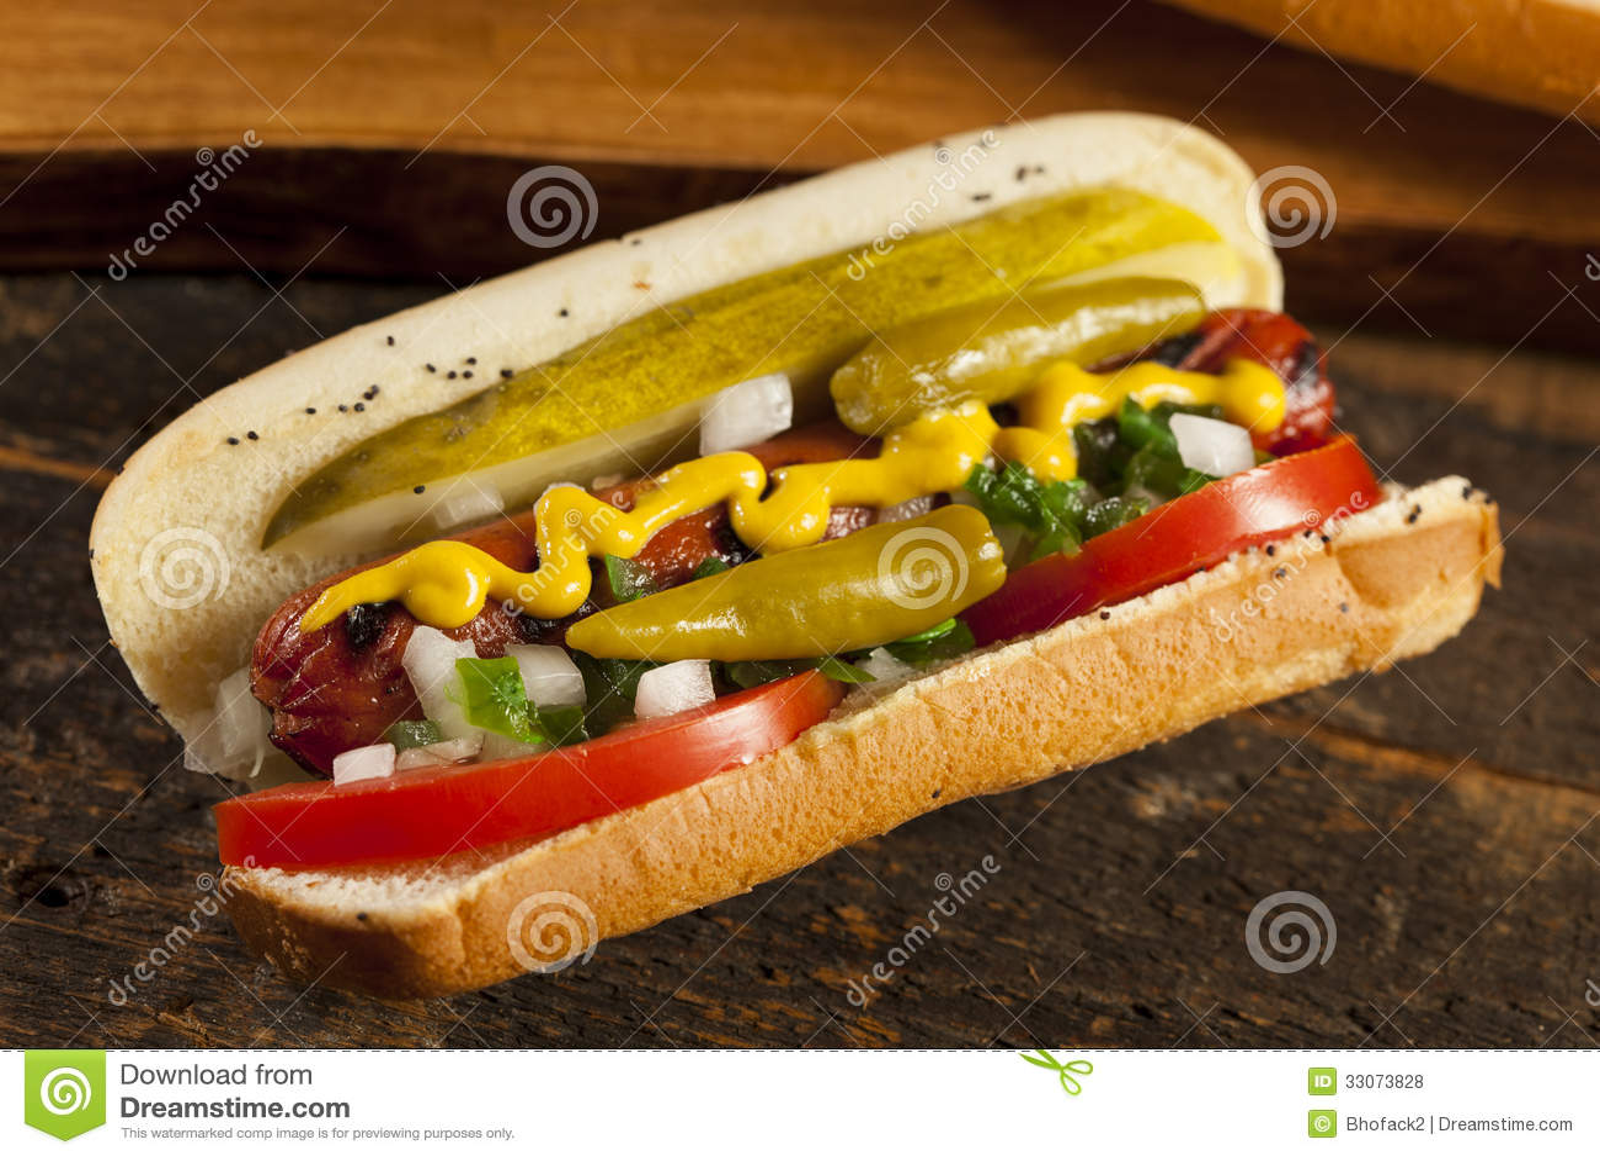 chicago art hotdog stockfoto bild von so e ketschup 33073828. Black Bedroom Furniture Sets. Home Design Ideas